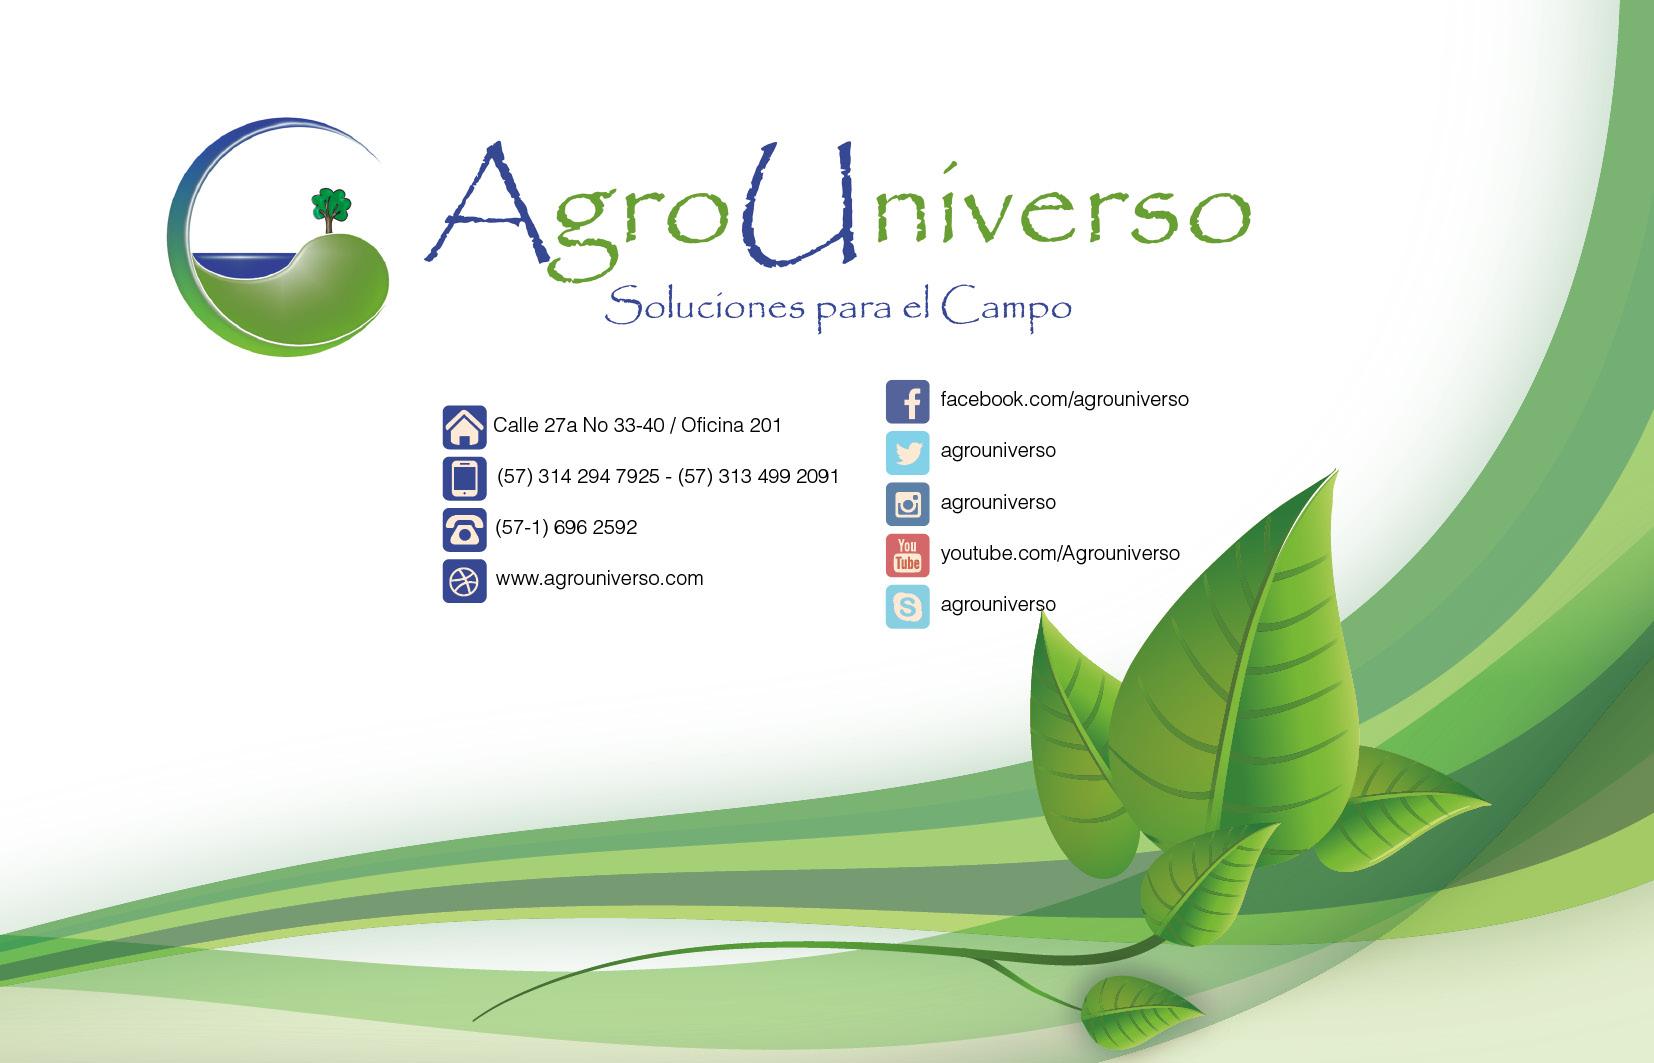 Catlogo-de-productos-Agrouniverso-40